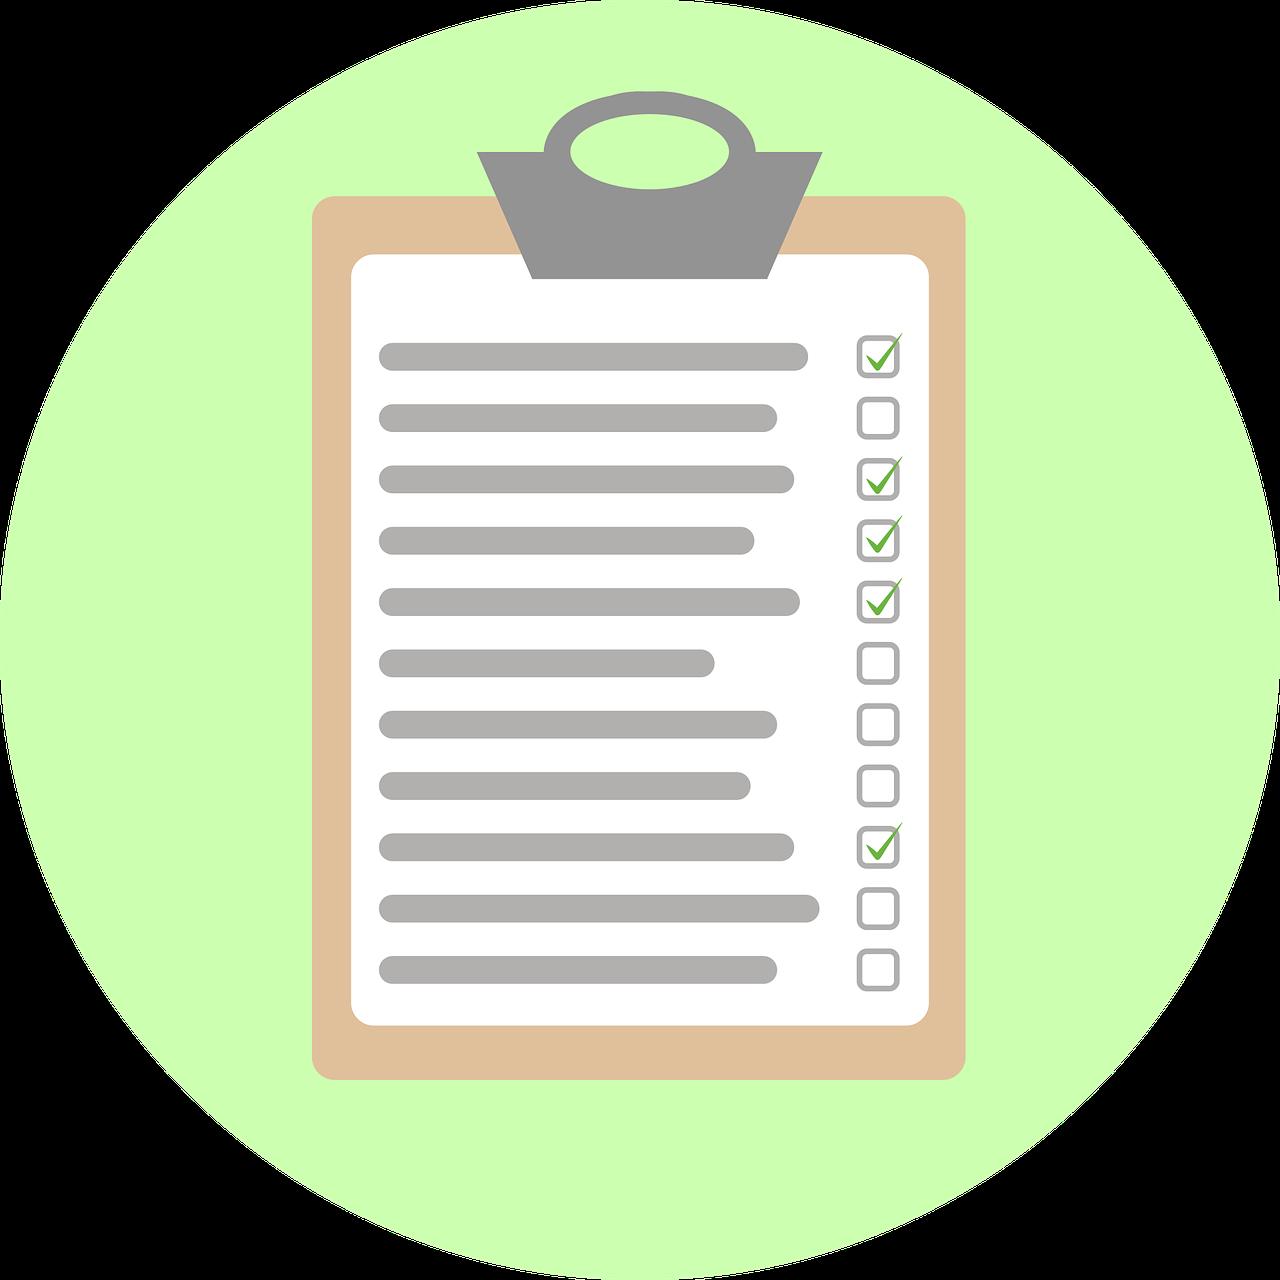 checklist-2023731_1280.png